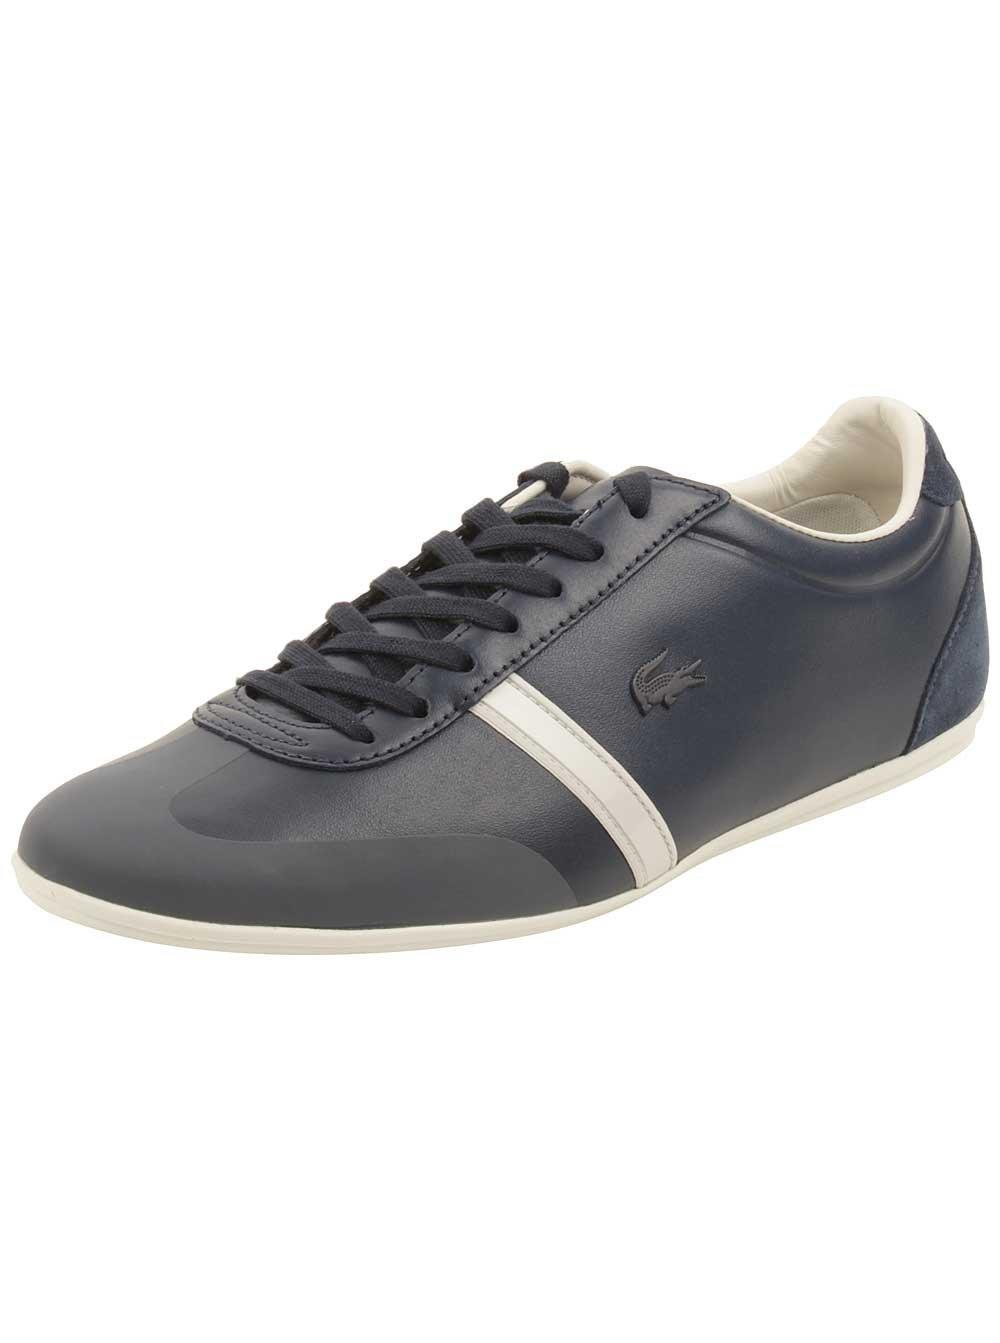 Lacoste Men's Mokara 316 1 Cam Fashion Sneaker, Navy, 9 M US